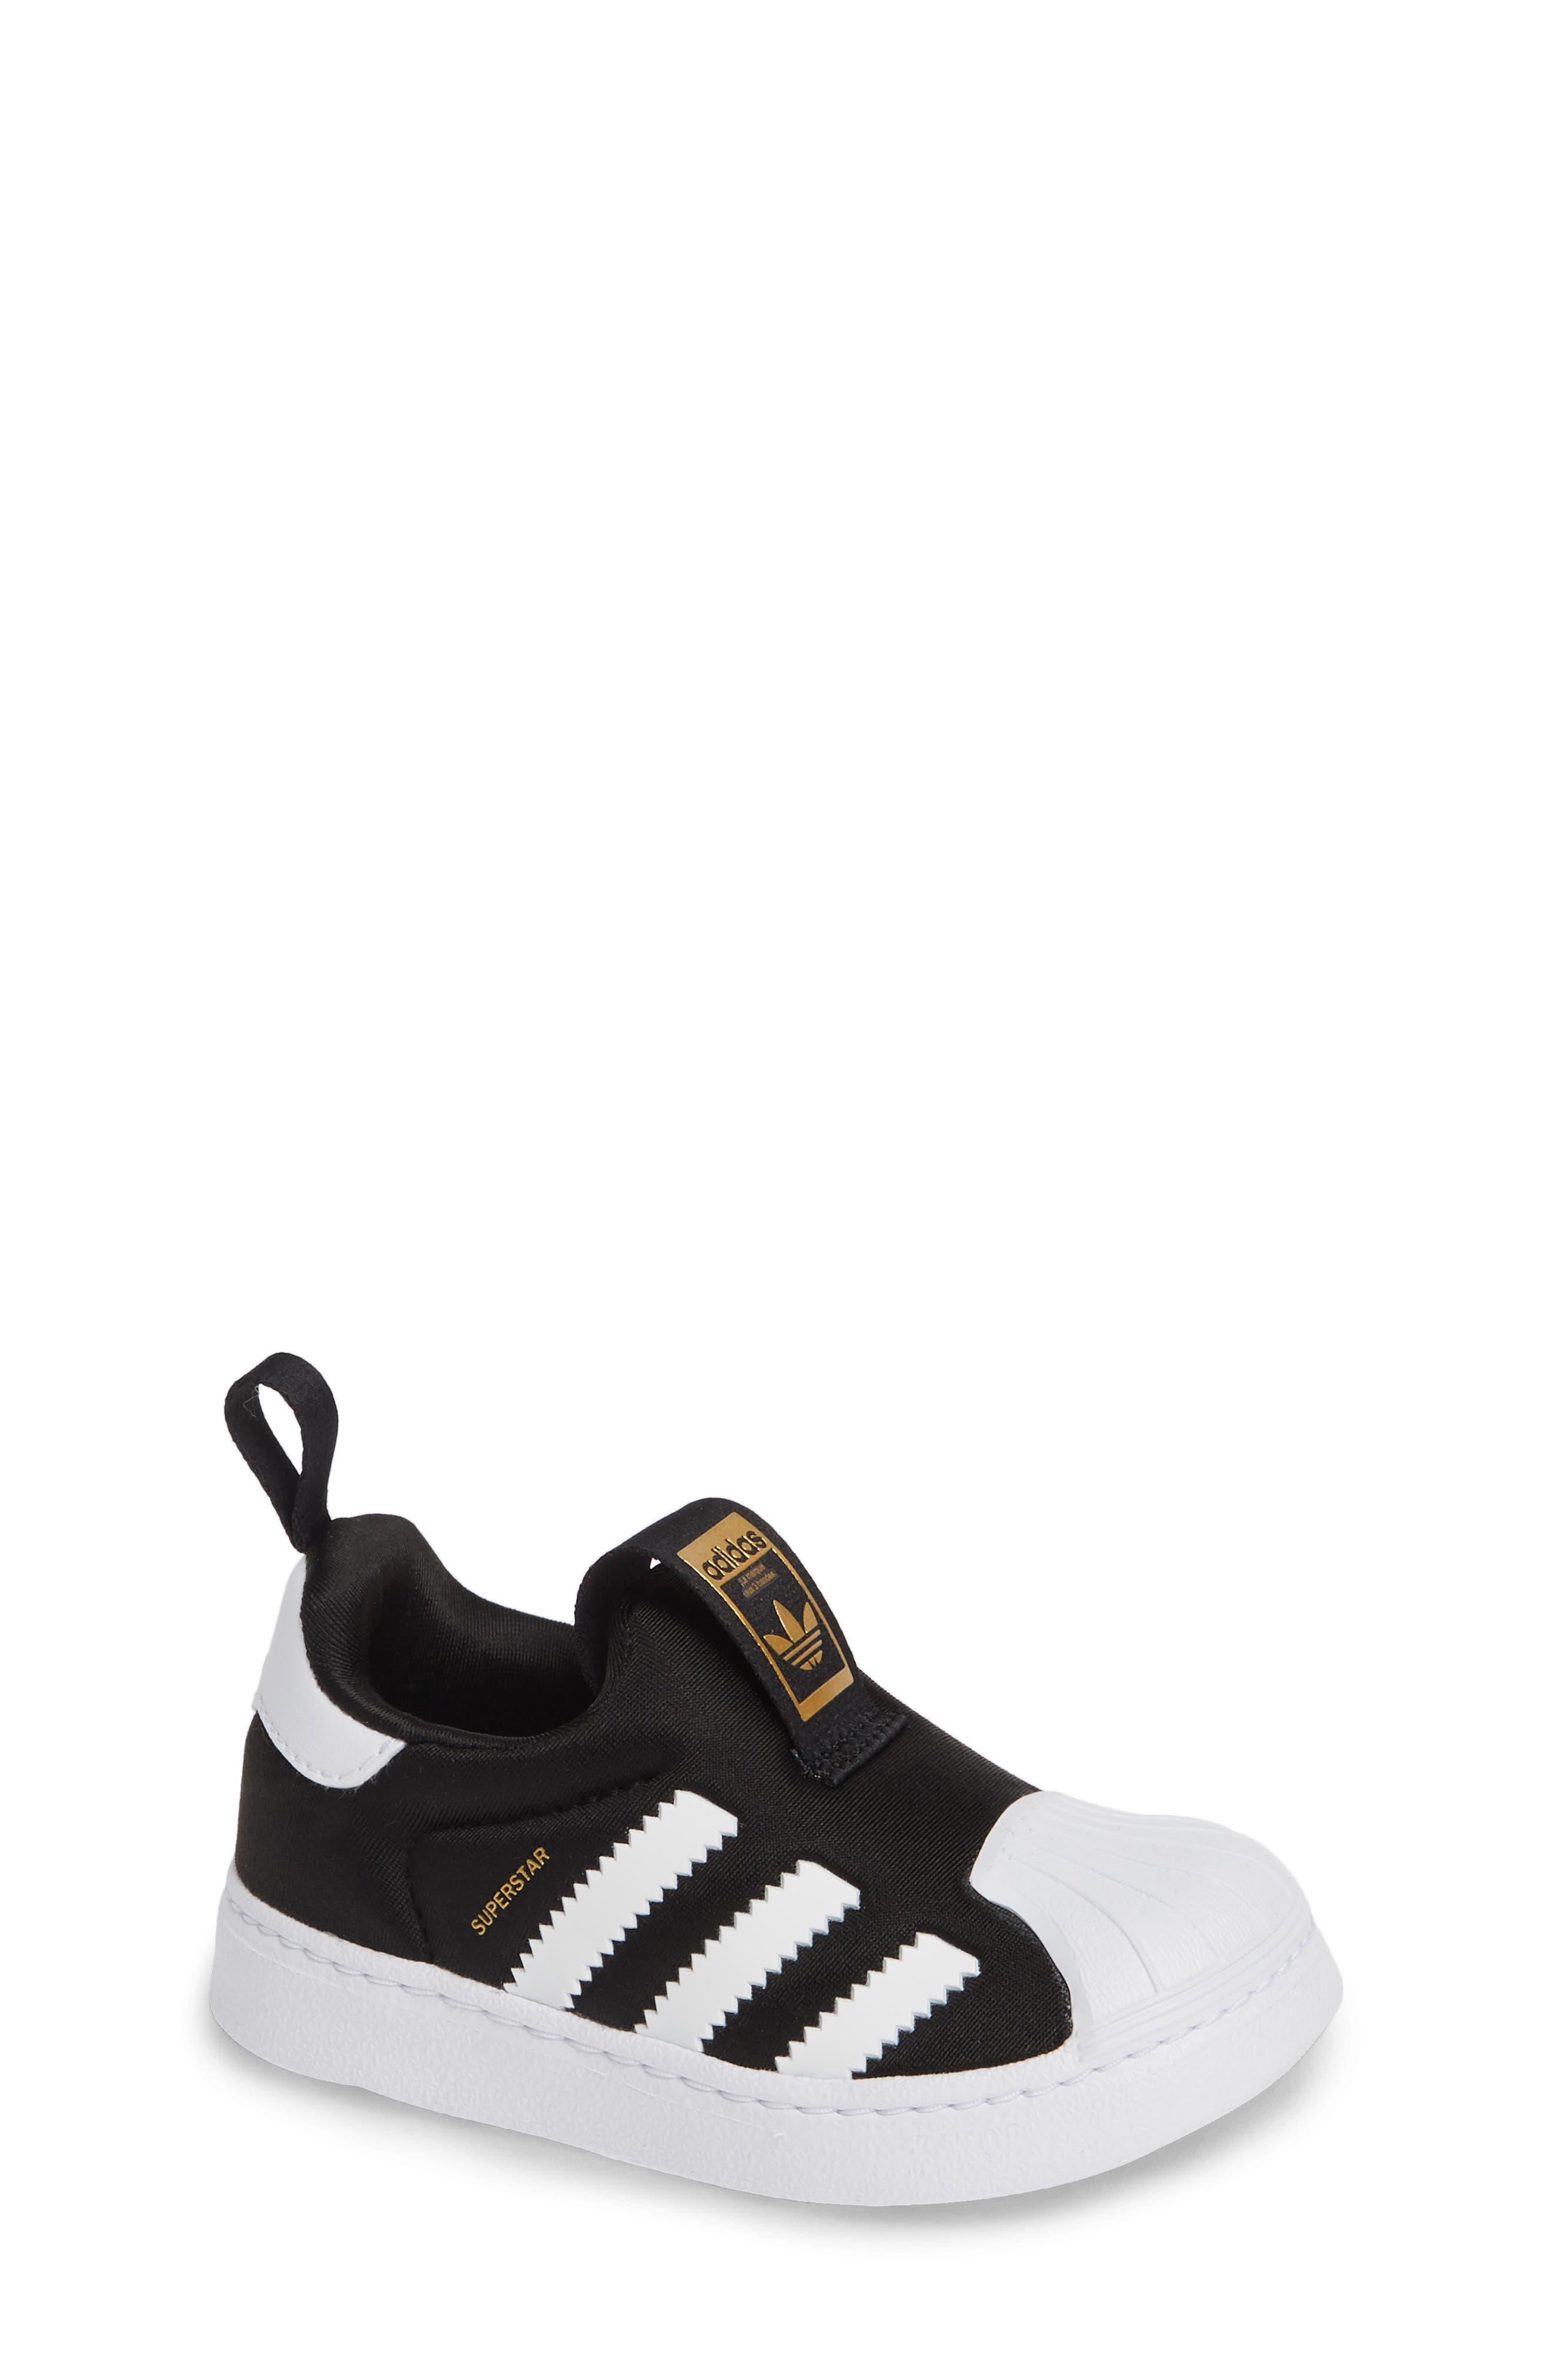 best website b308e fcc3d Baby, Walker   Toddler Adidas Shoes   Nordstrom